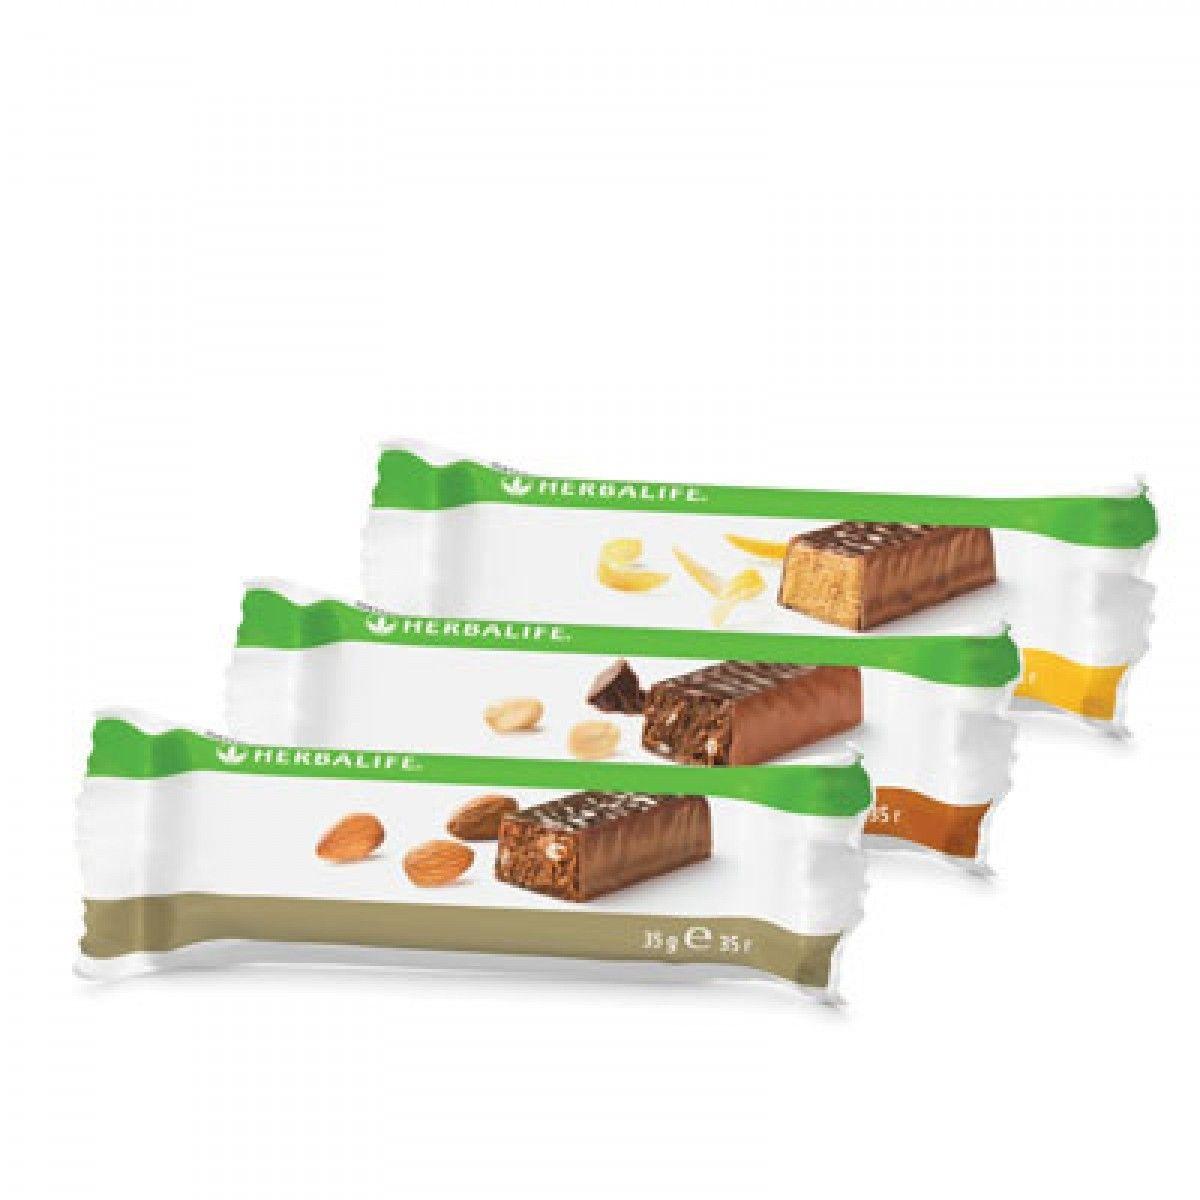 Protein Bar Deluxe All Flavors Proteinas Magra Hidratos De Carbono